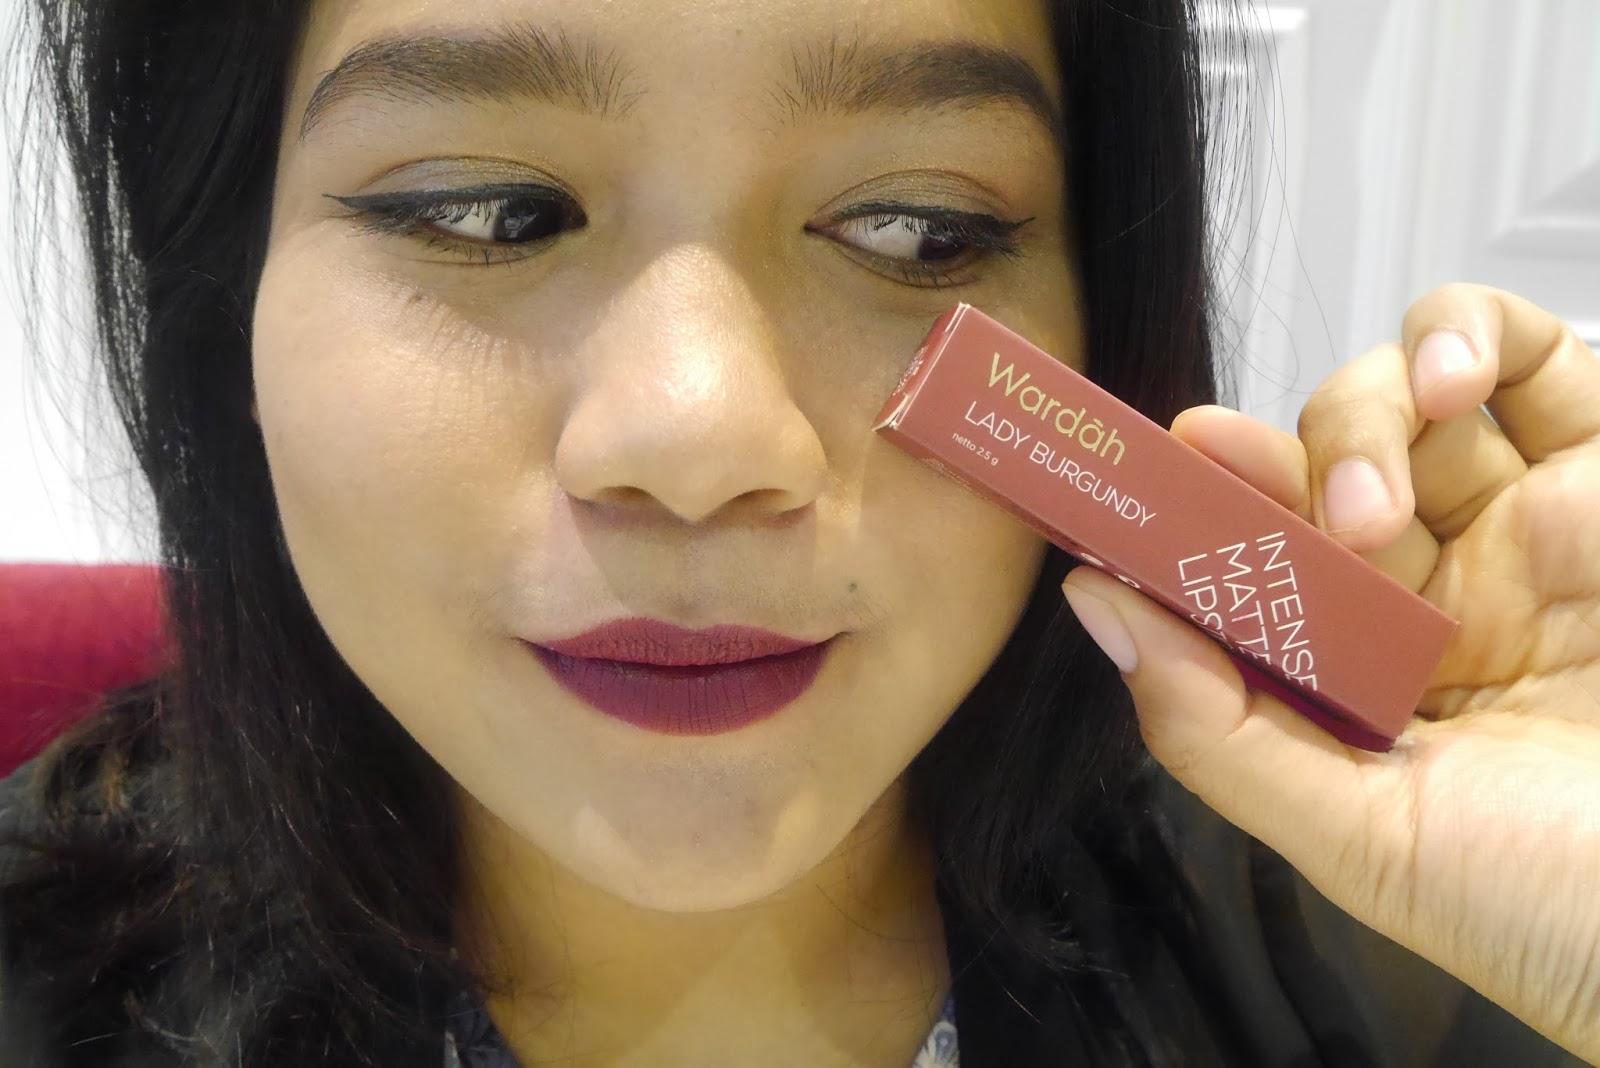 Wardah Intense Matte Lipstick Lady Burgundy Daftar Harga Terbaru Passionate Pink 07 25gr Source Shade